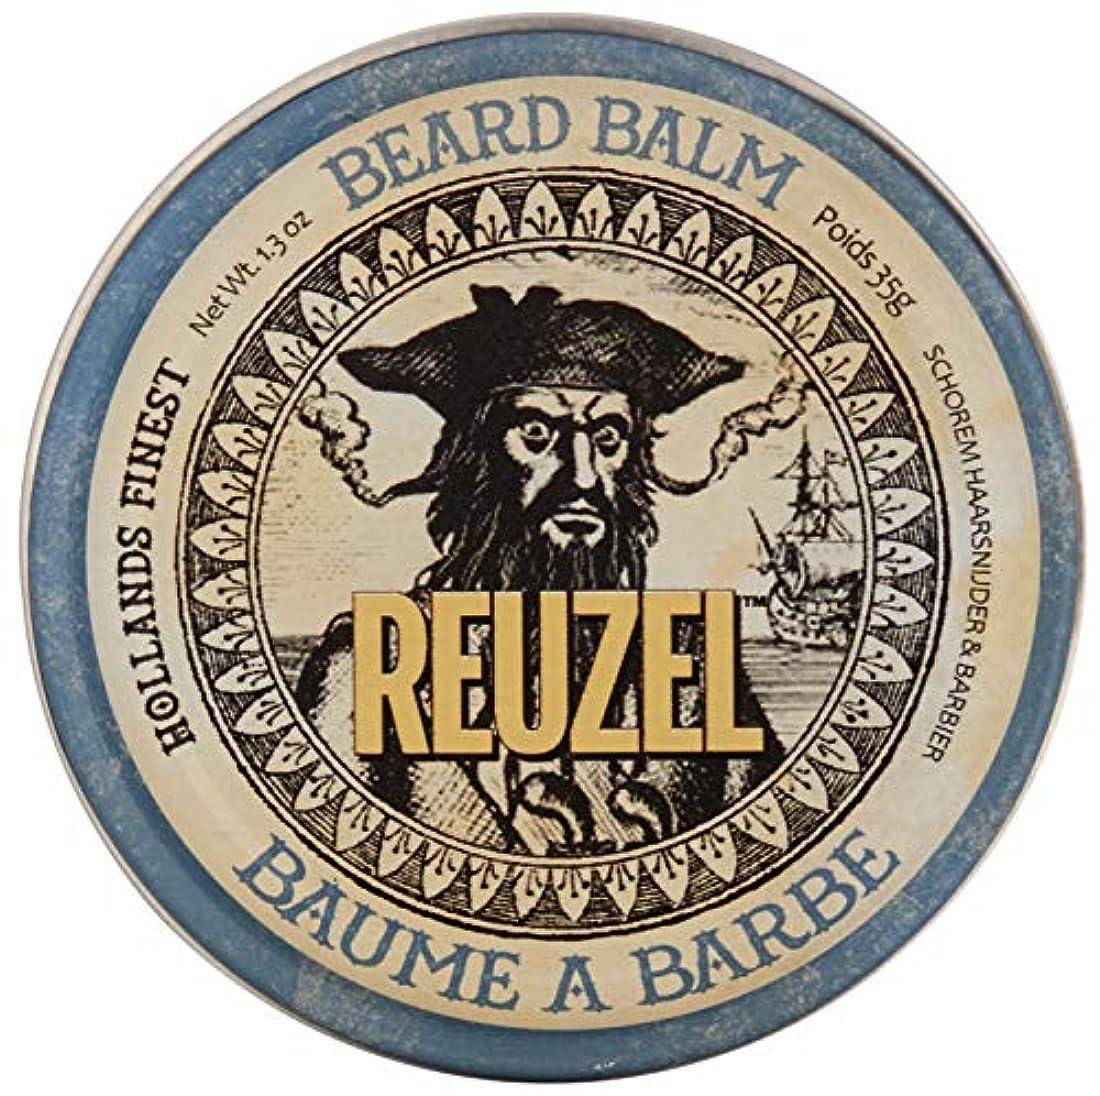 解放最愛の場所reuzel BEARD BALM 1.3 oz by REUZEL